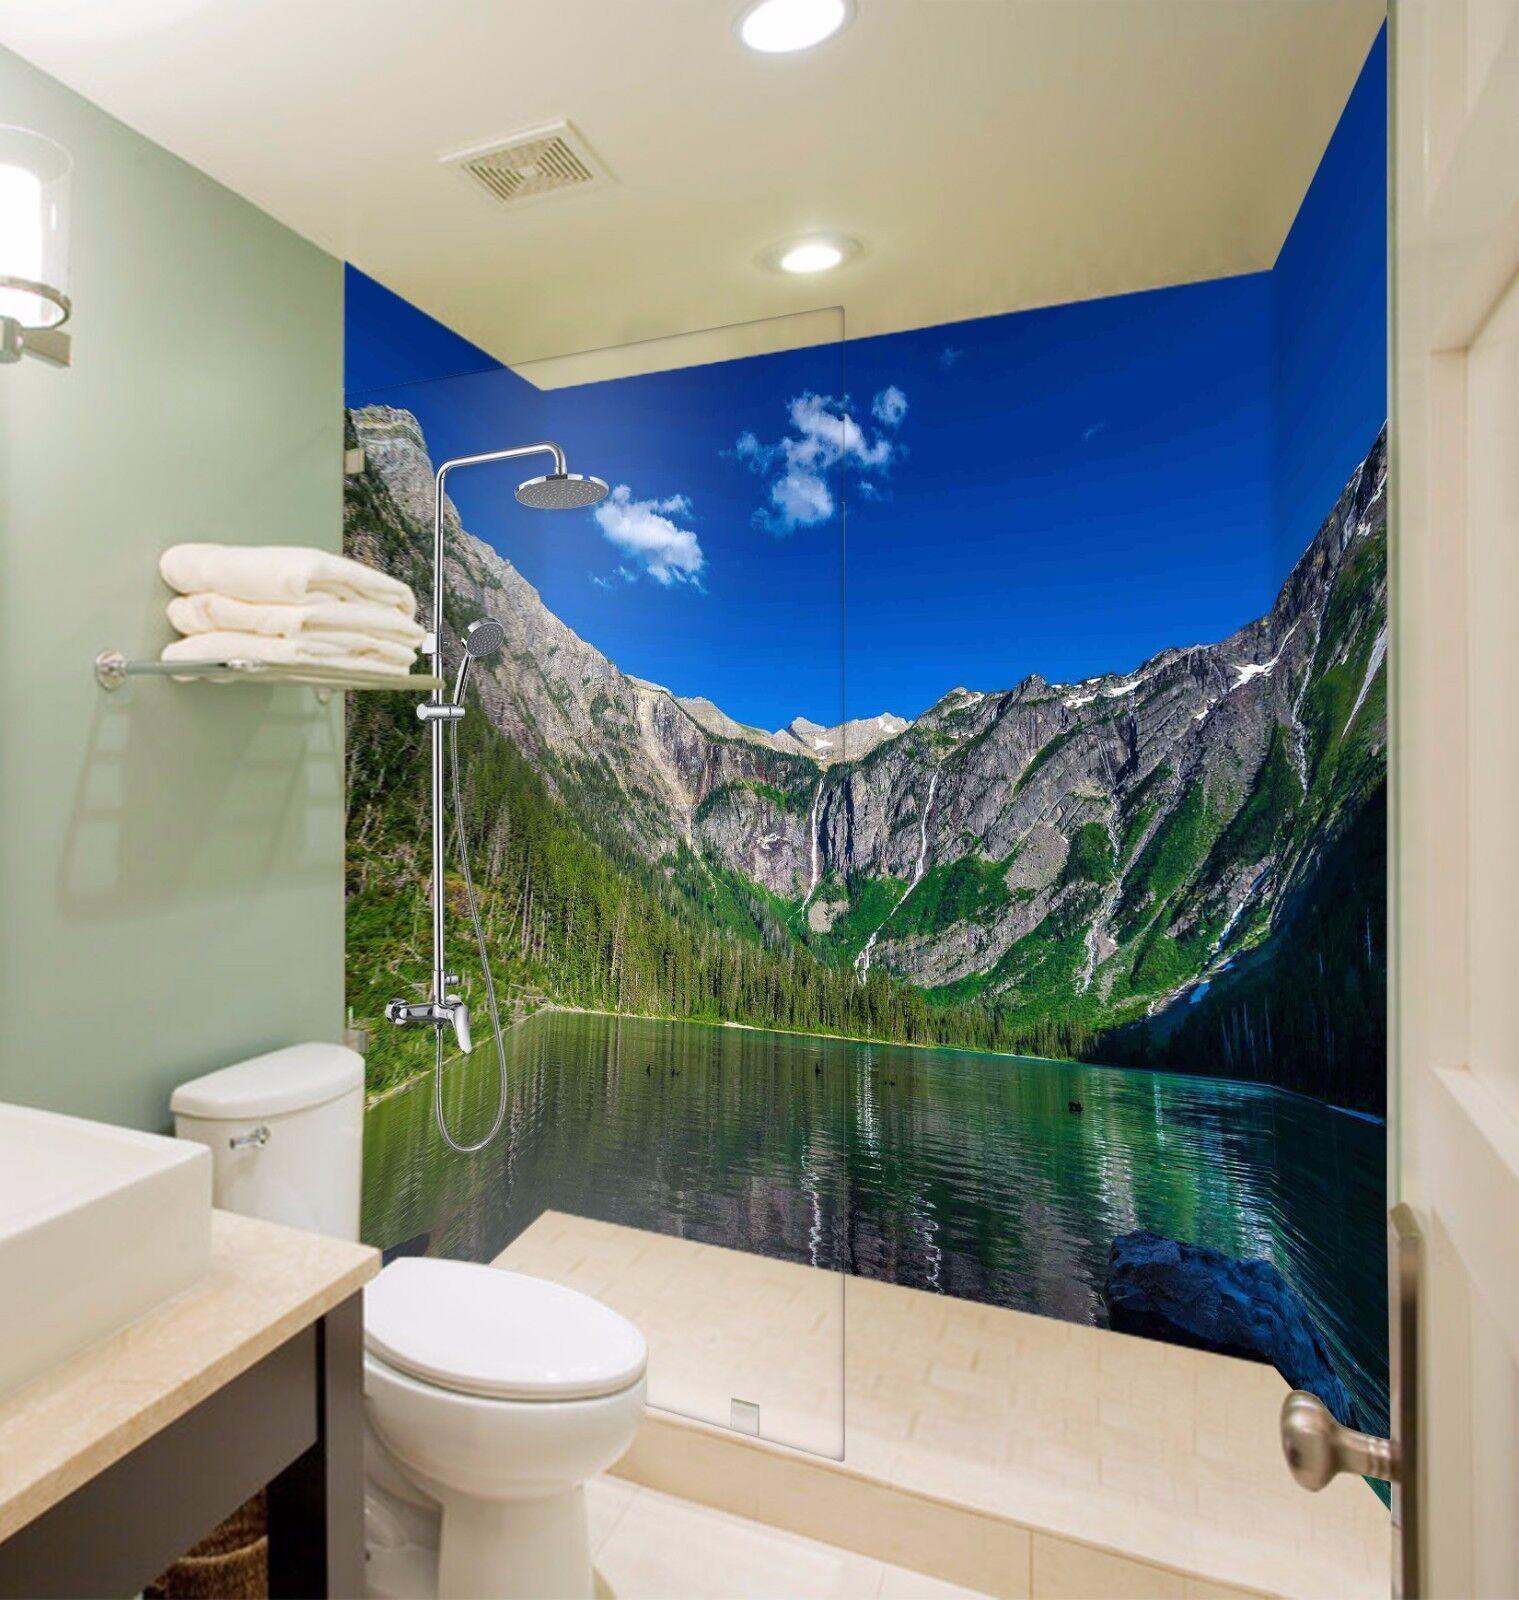 3D Mountain Lake 528 WallPaper Bathroom Print Decal Wall Deco AJ WALLPAPER AU